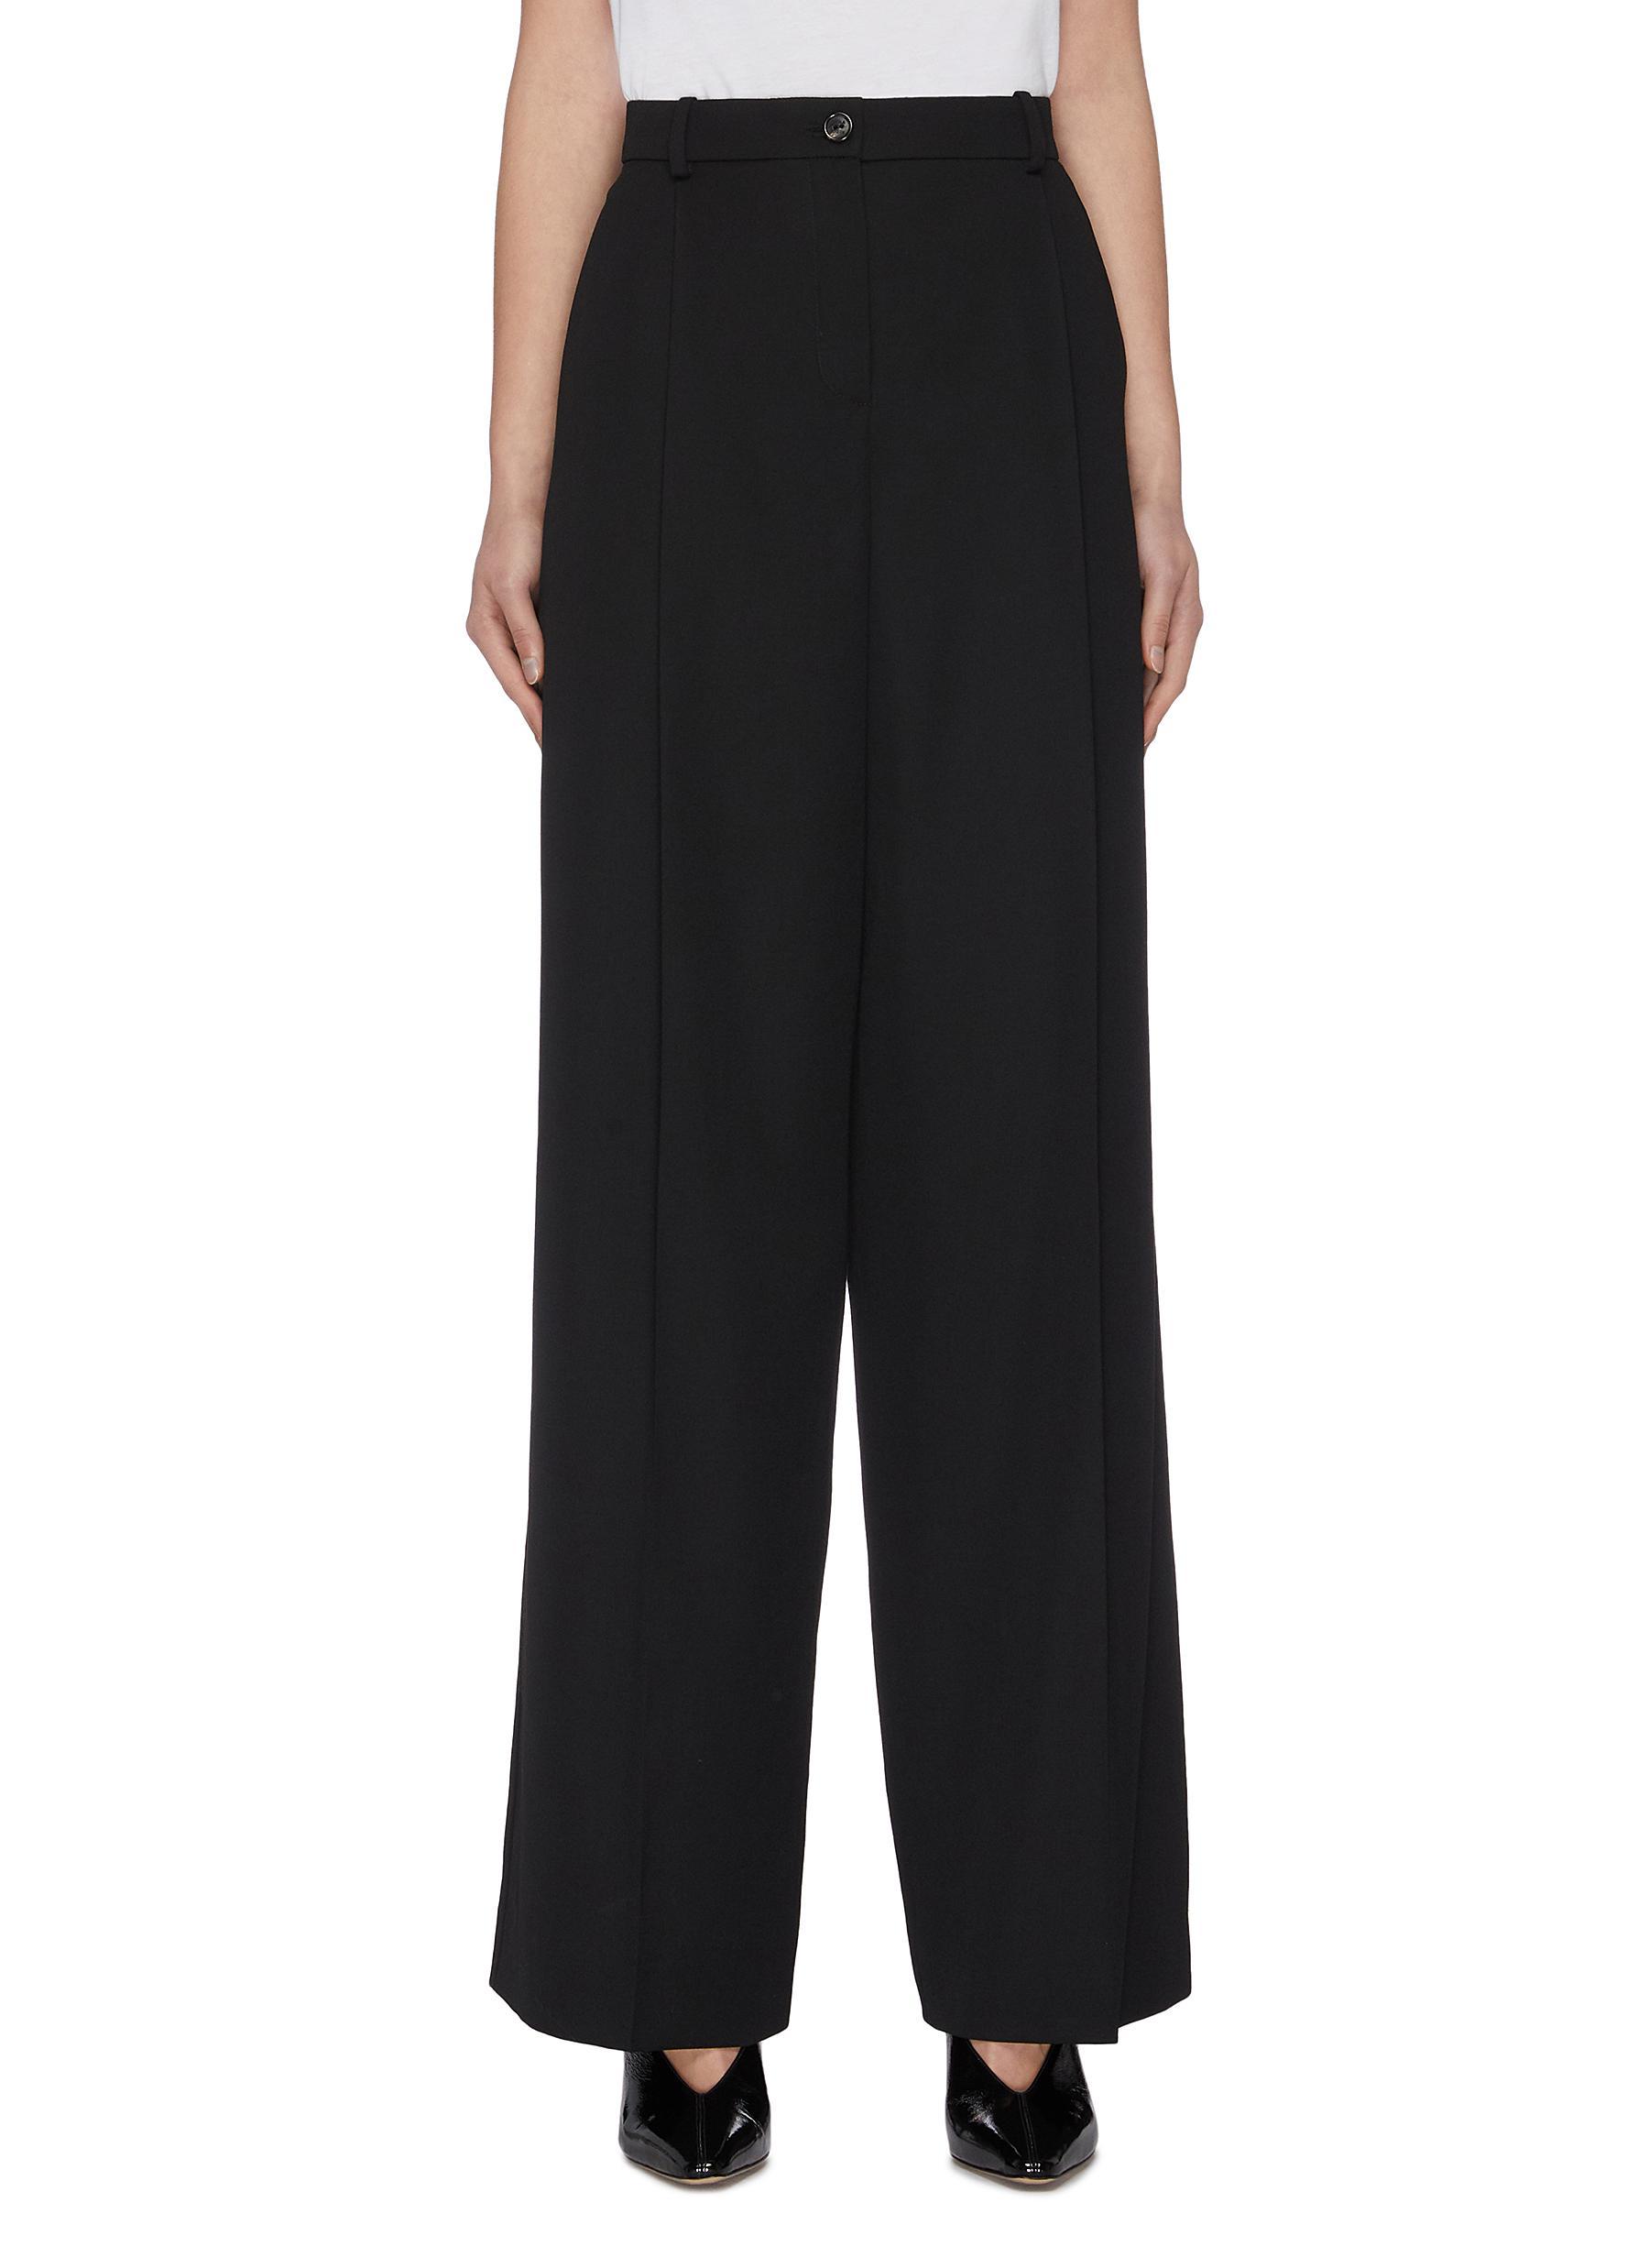 Buy Nina Ricci Pants & Shorts Wide leg wool suiting pants